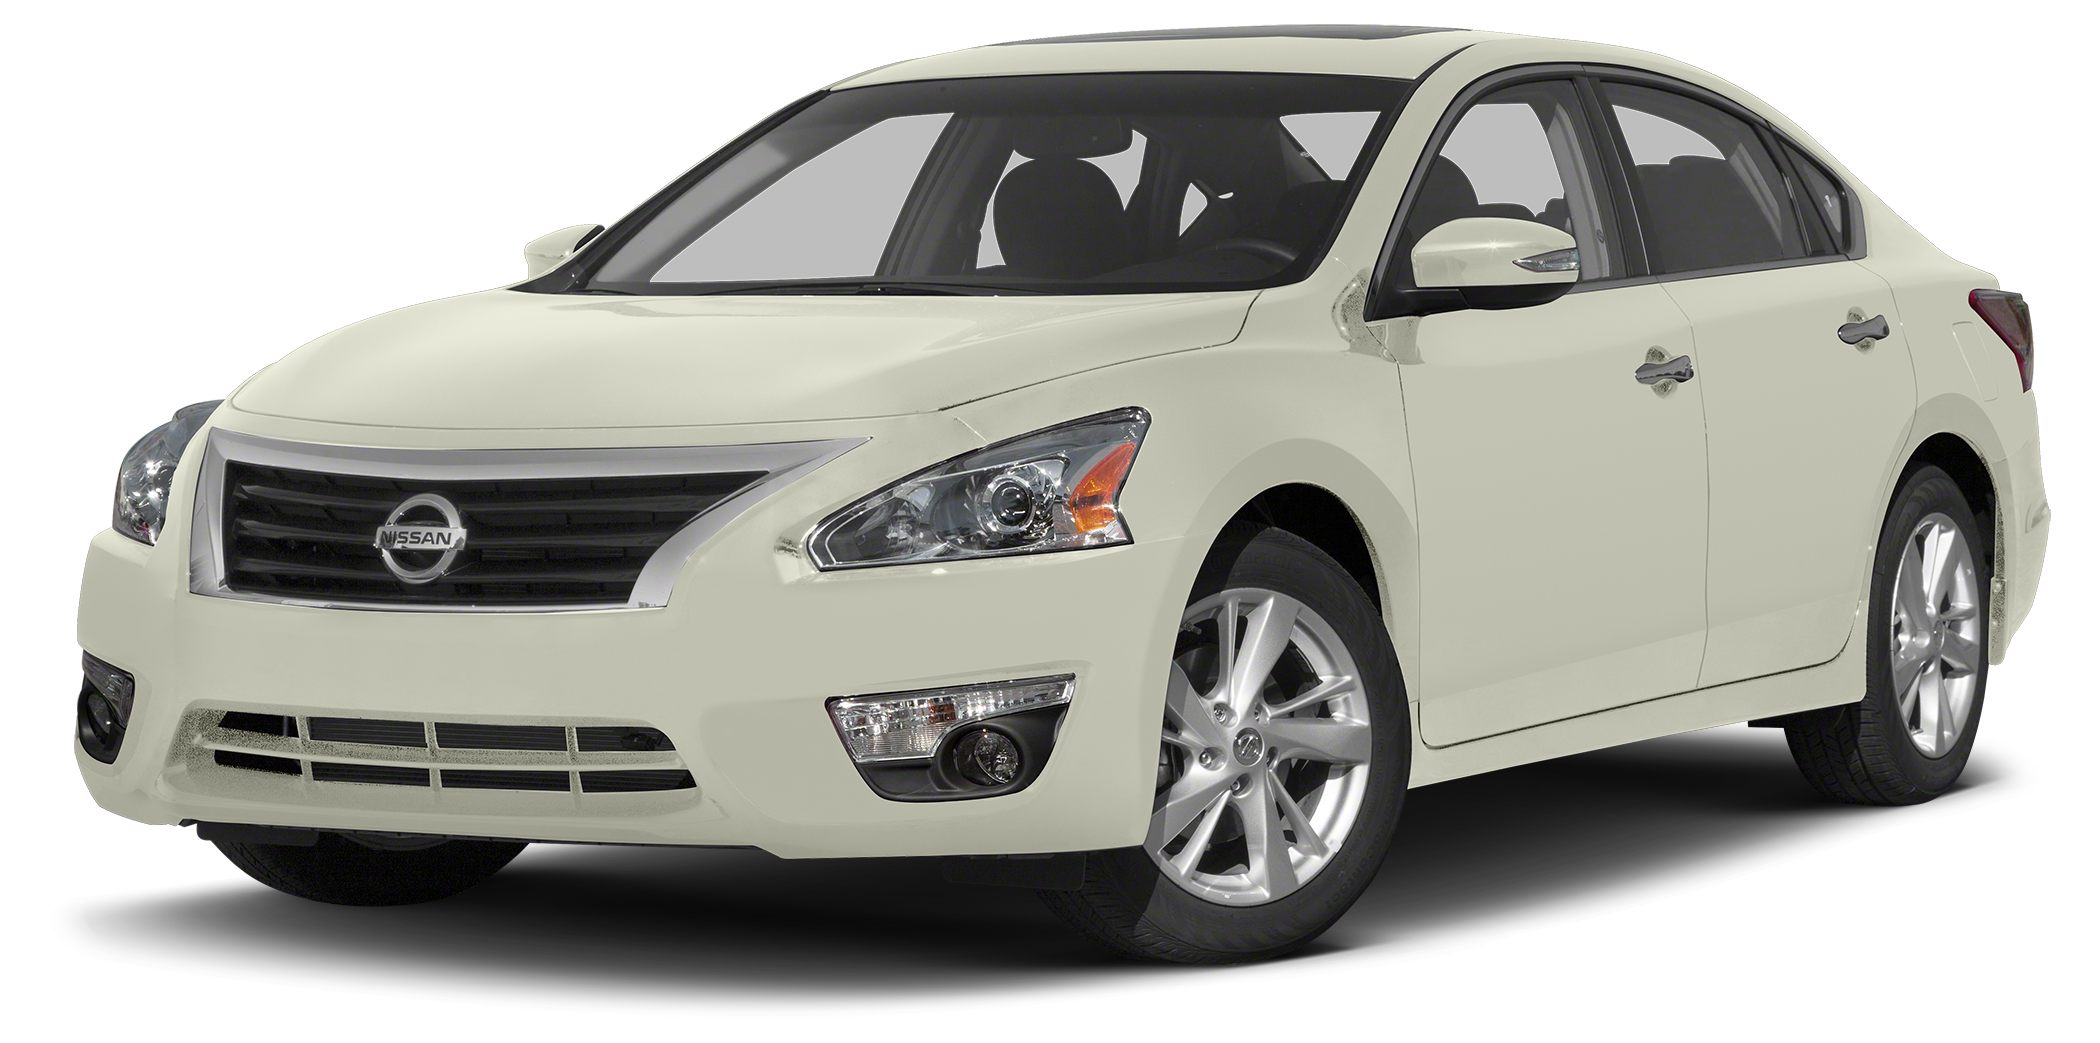 2013 Nissan Altima 25 SL Miles 15518Color Pearl White Stock N2485A VIN 1N4AL3AP5DN409117